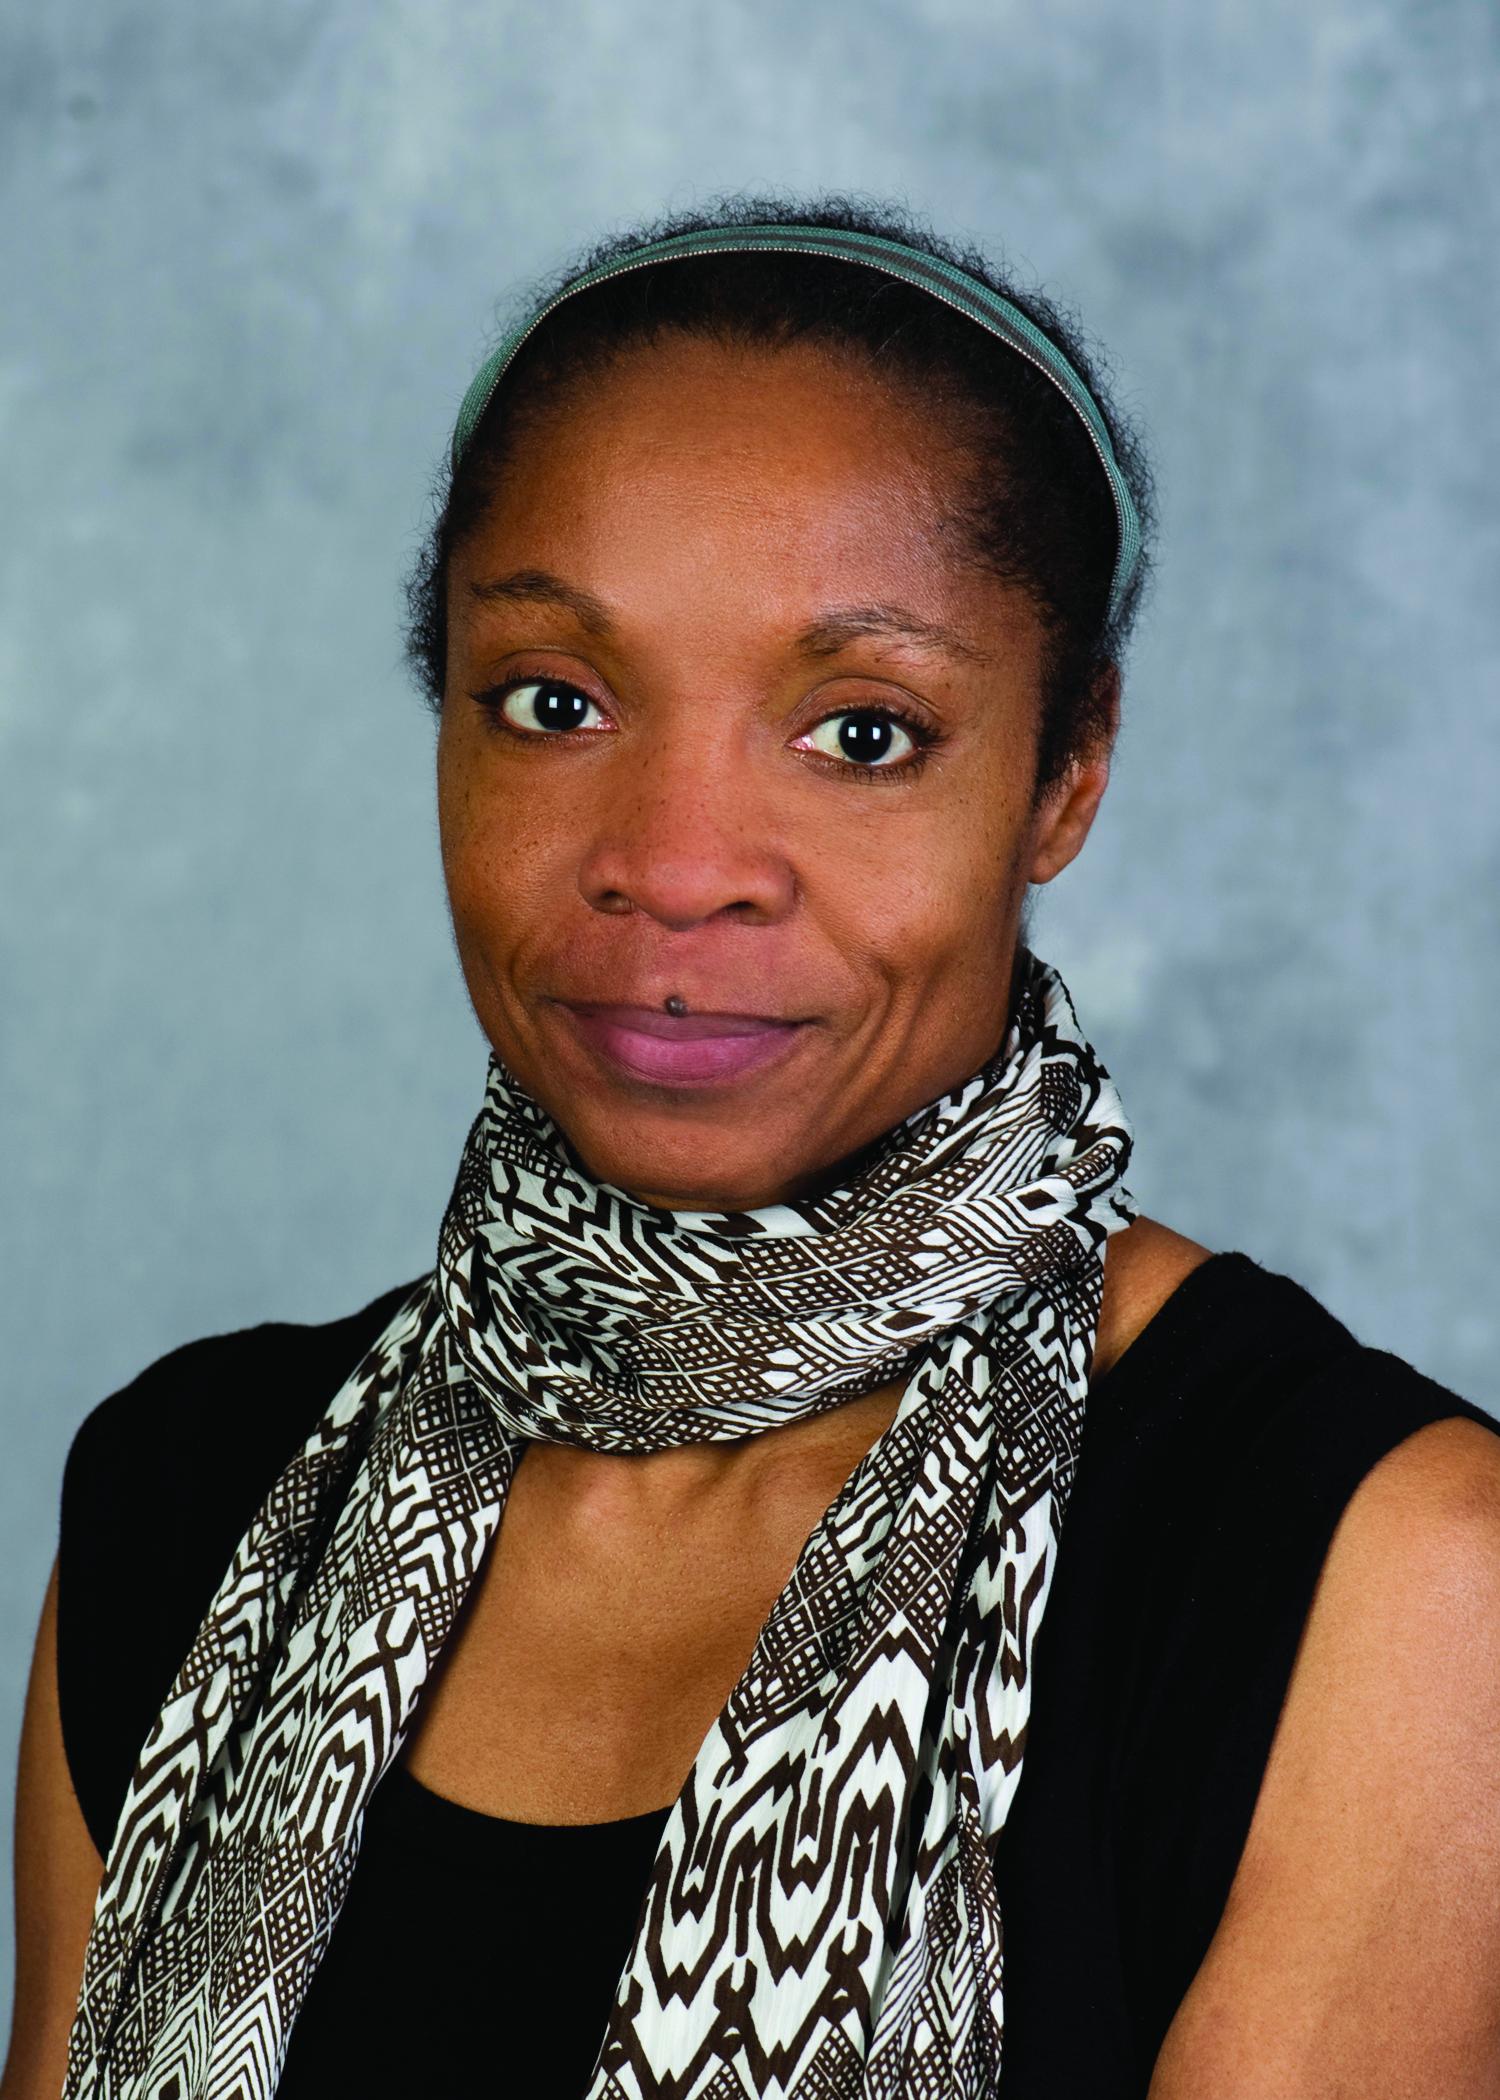 A head and shoulder photograph of Allison Joseph, poet